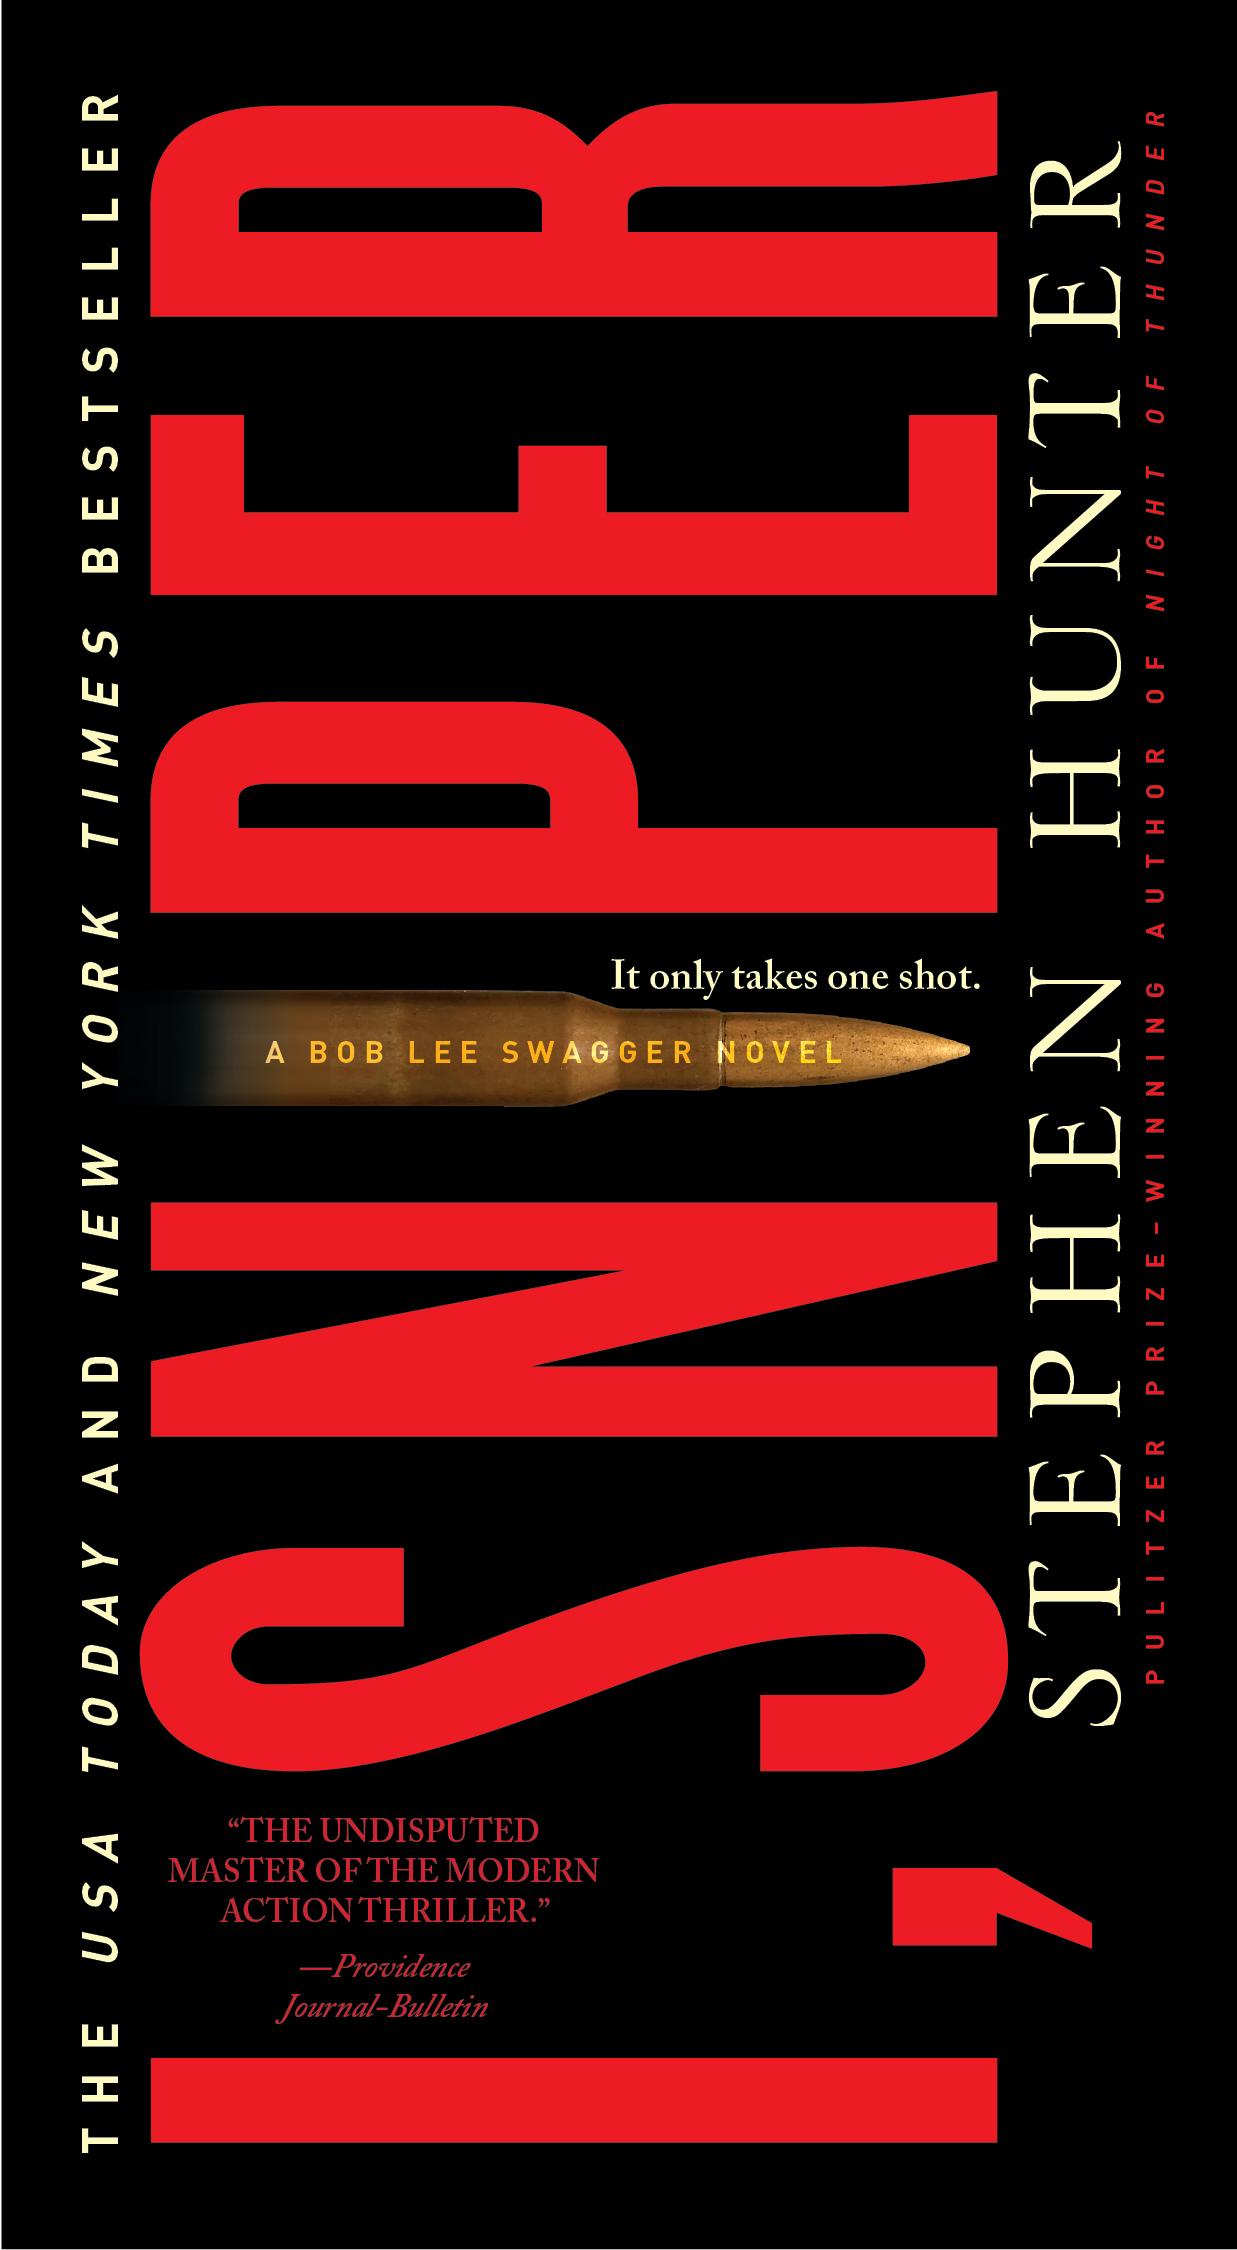 Book Cover Image (jpg): I, Sniper